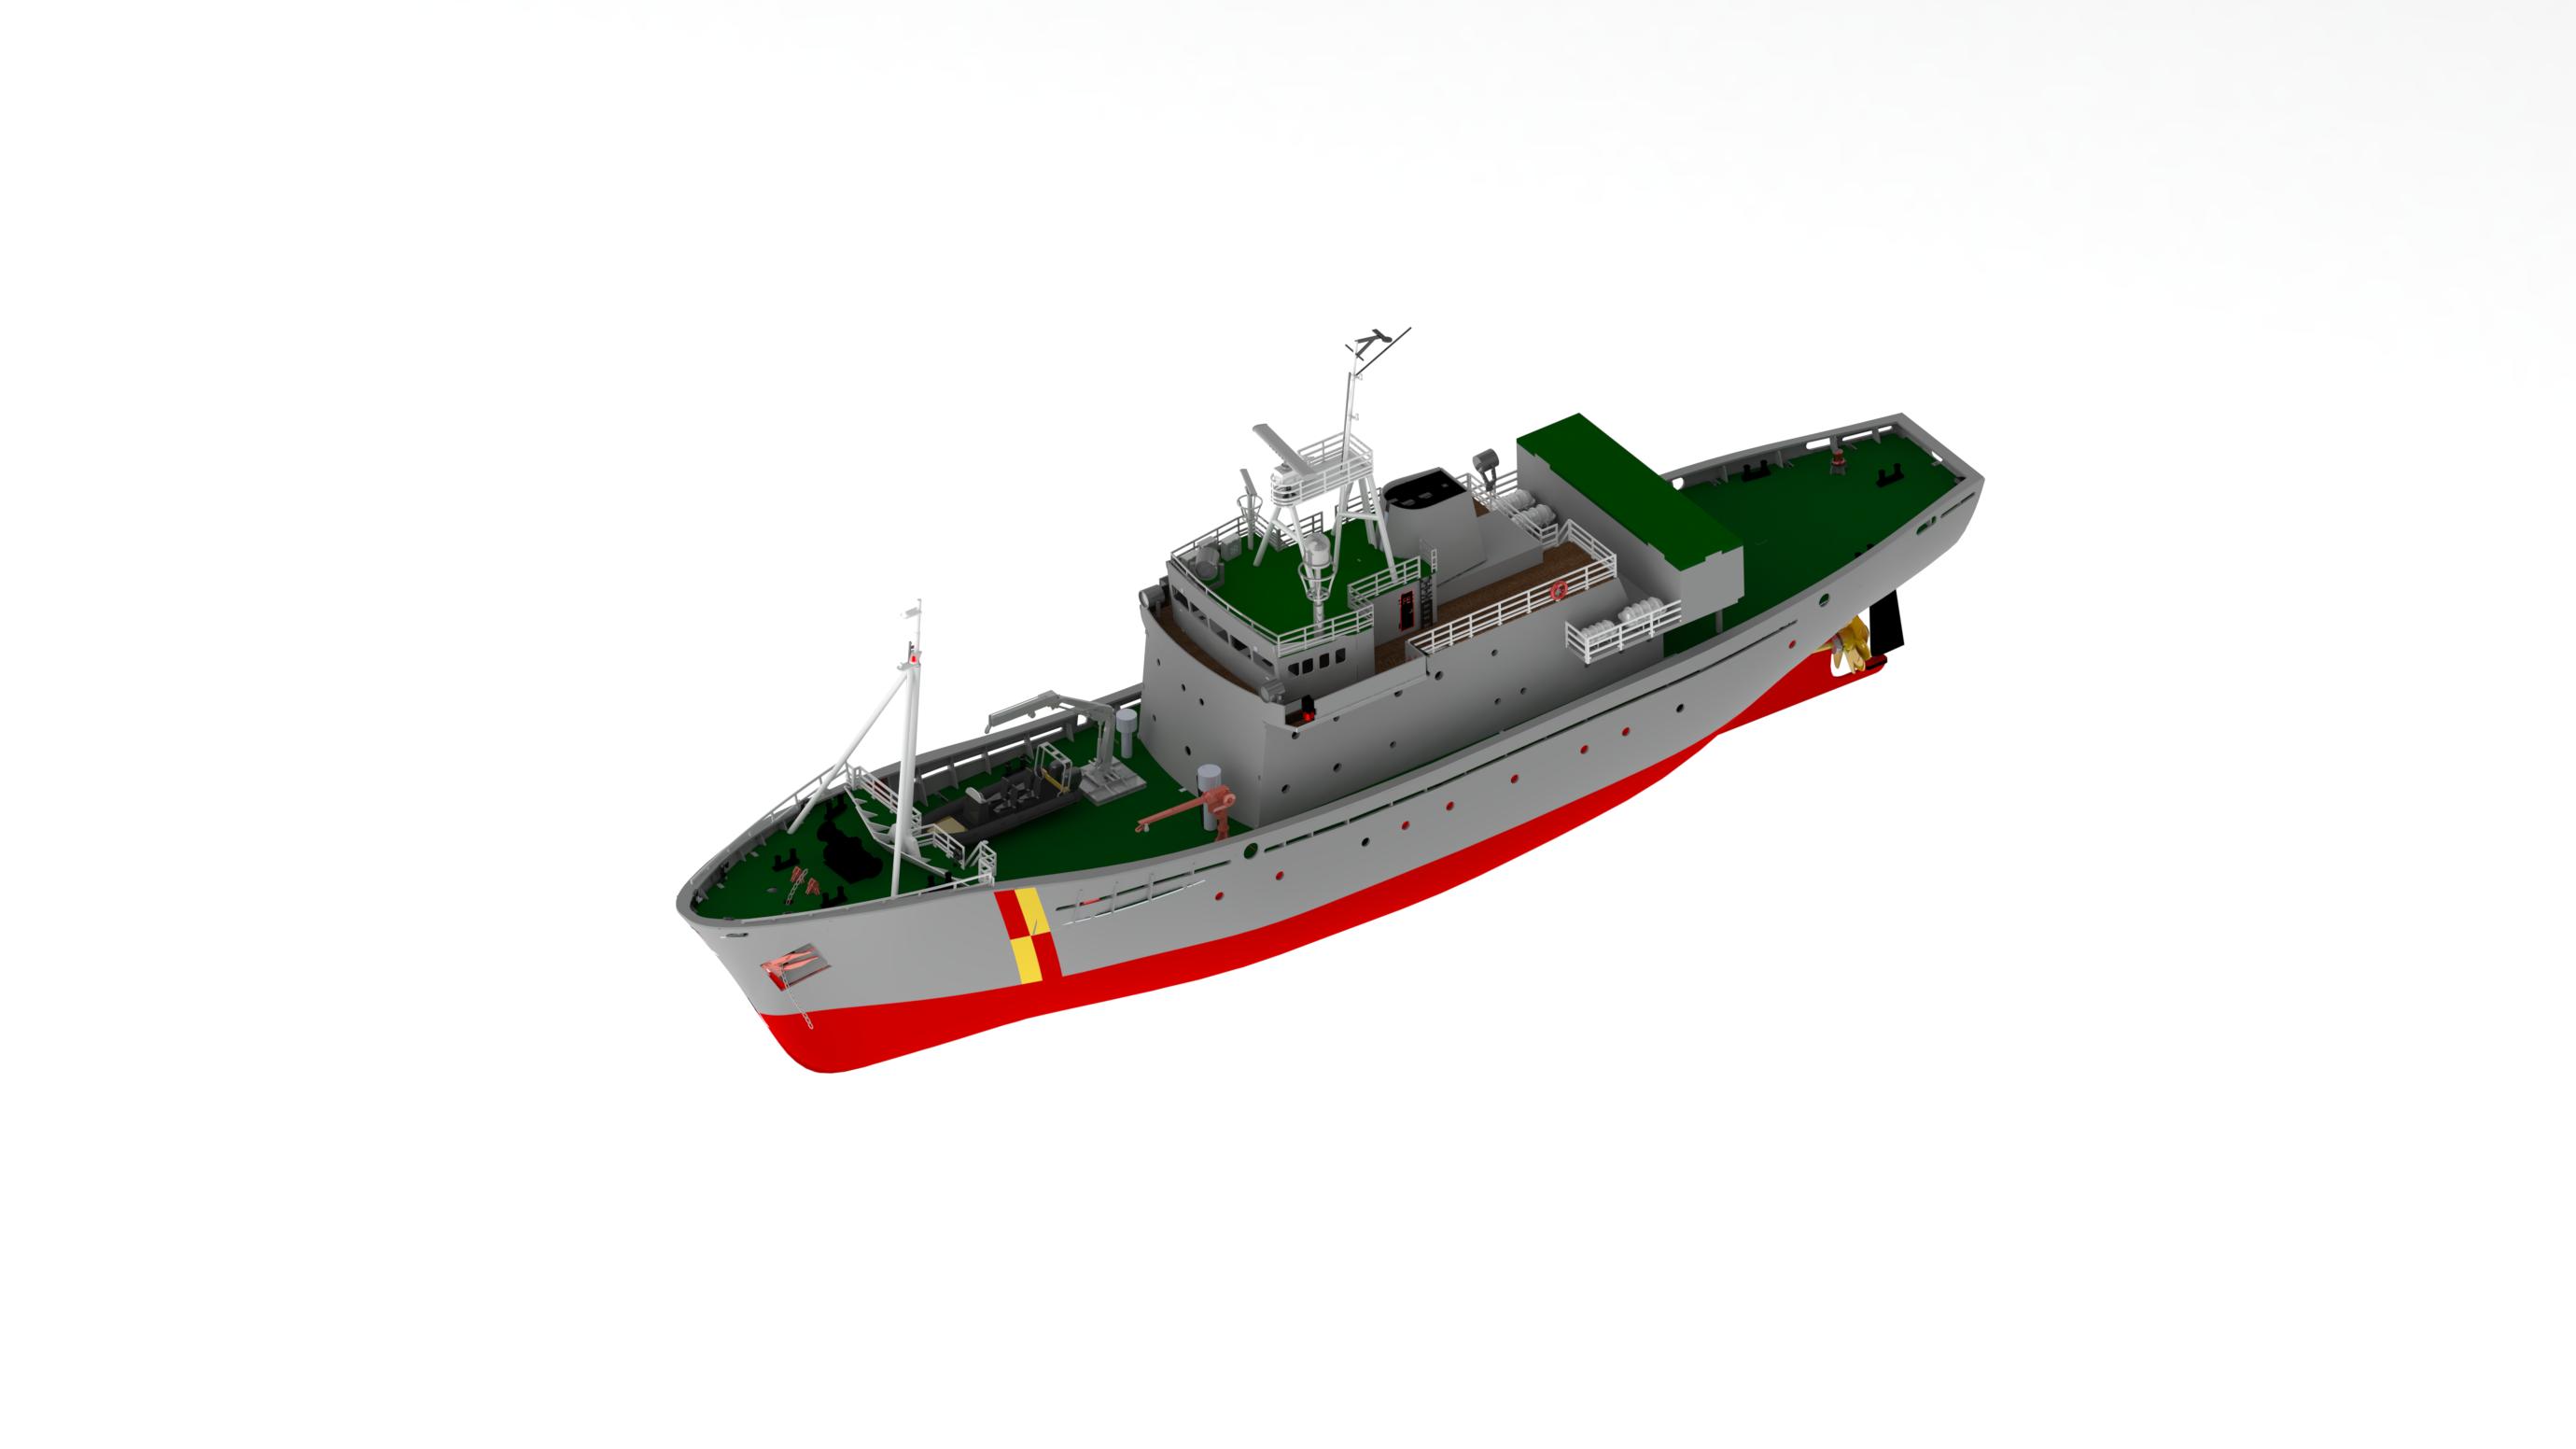 FPV Westra Scottish Fisher Protection Vessel (Turk, 1:50)